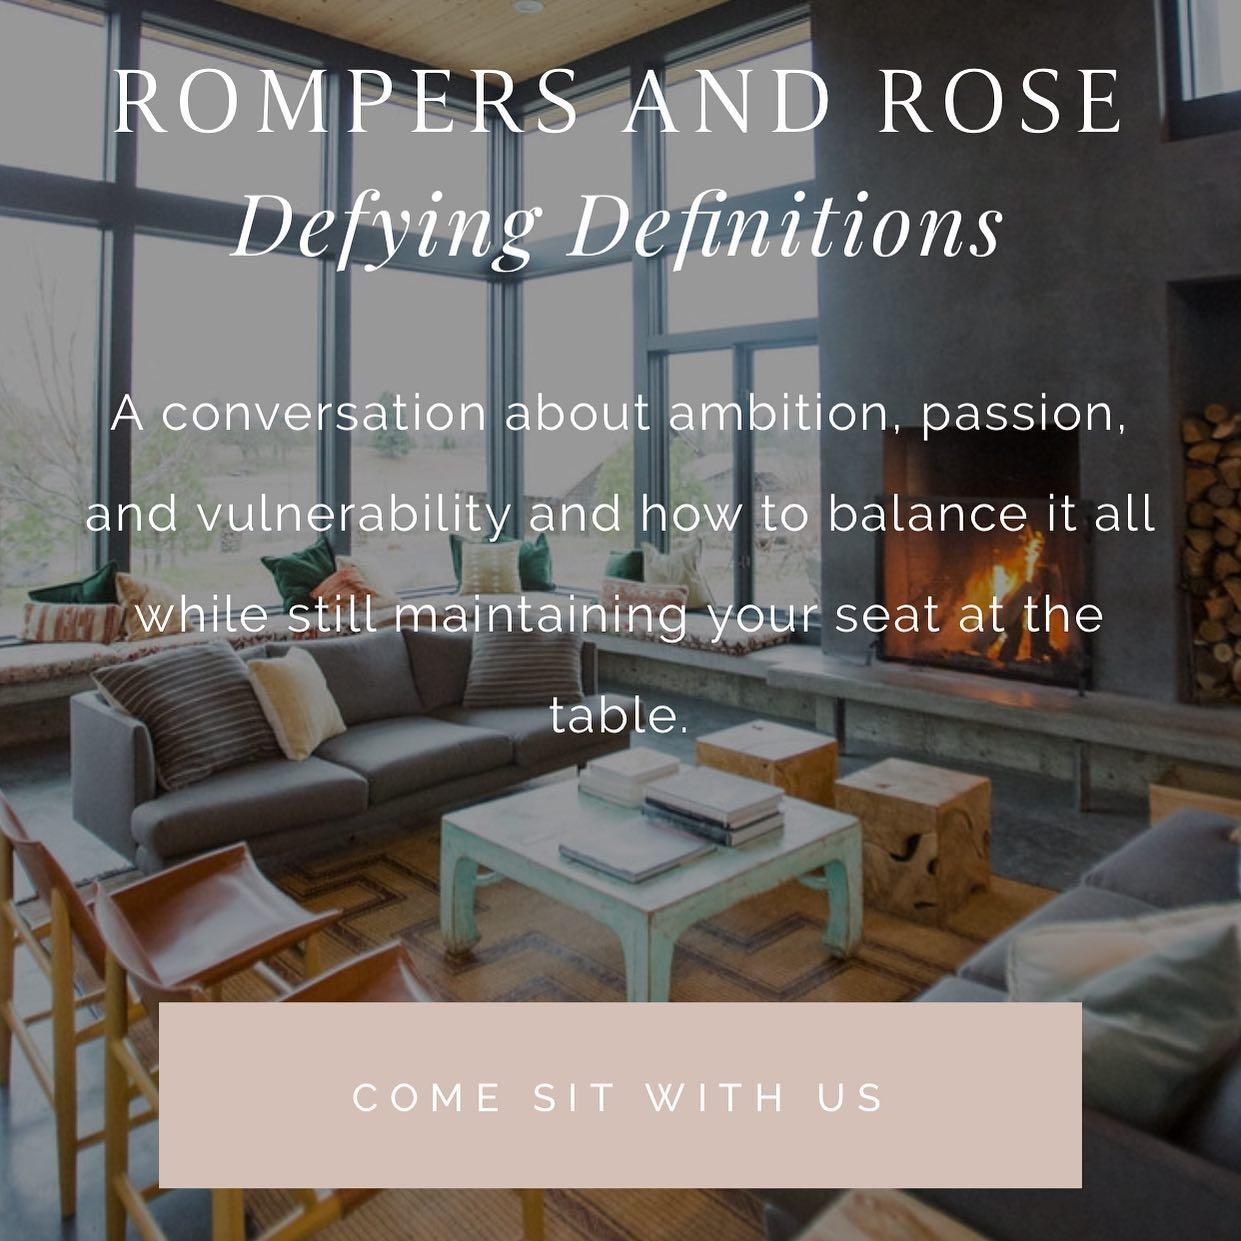 TCB-Rompers+Rose 2019.jpg